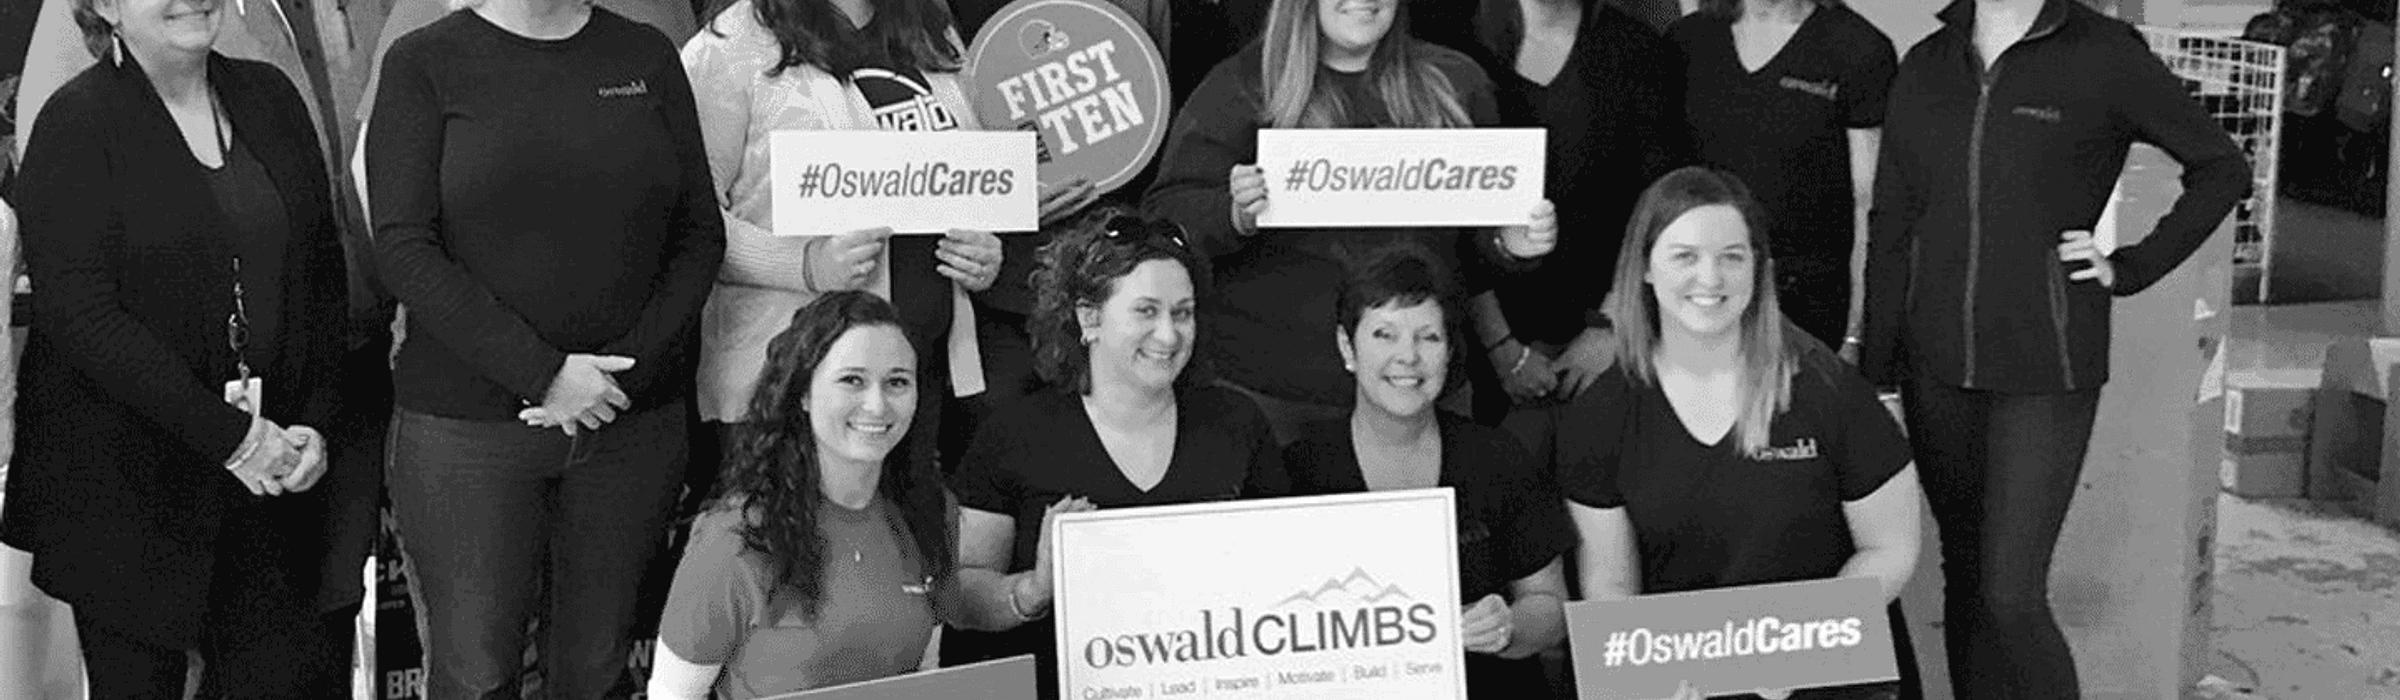 Oswald Climbs